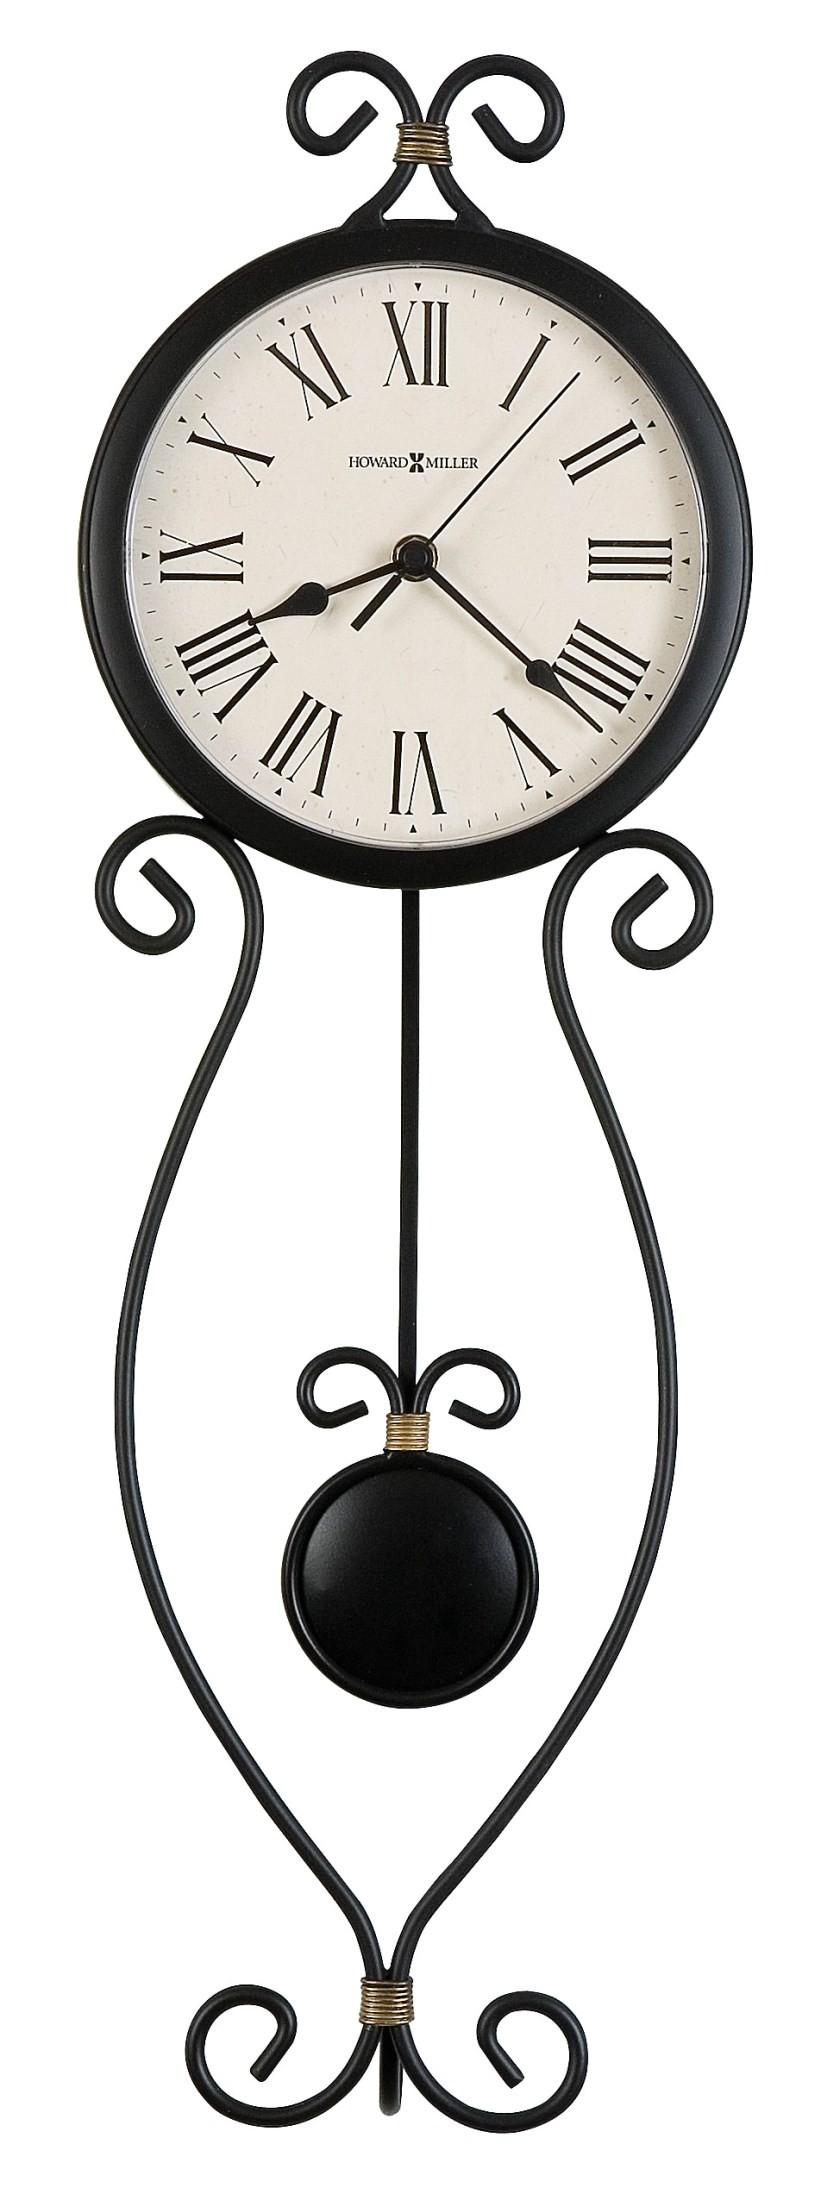 ivana wall clock from howard miller 625495 coleman